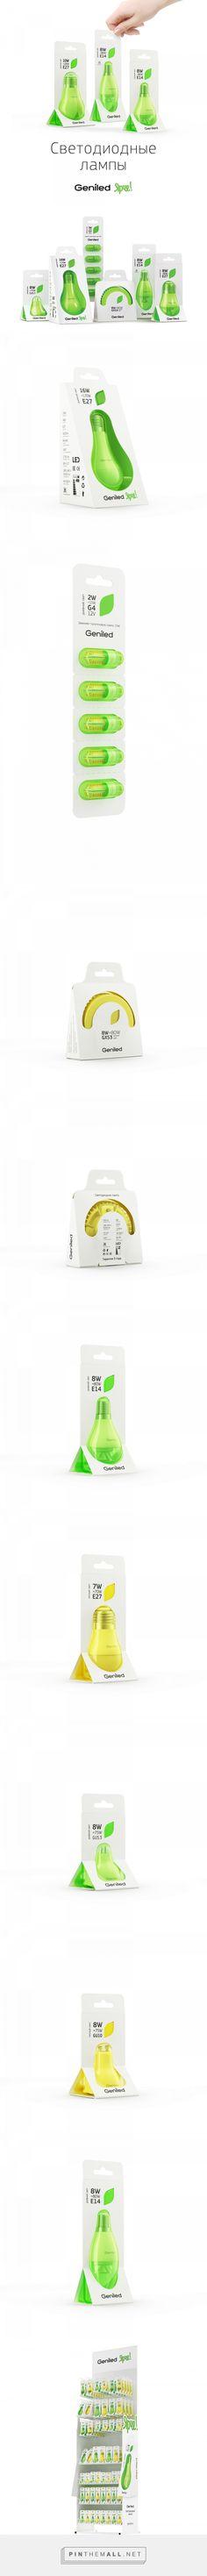 Geniled Bright Led Bulbs packaging design by Evgeniy Pelin - http://www.packagingoftheworld.com/2017/02/geniled-bright-led-bulbs.html